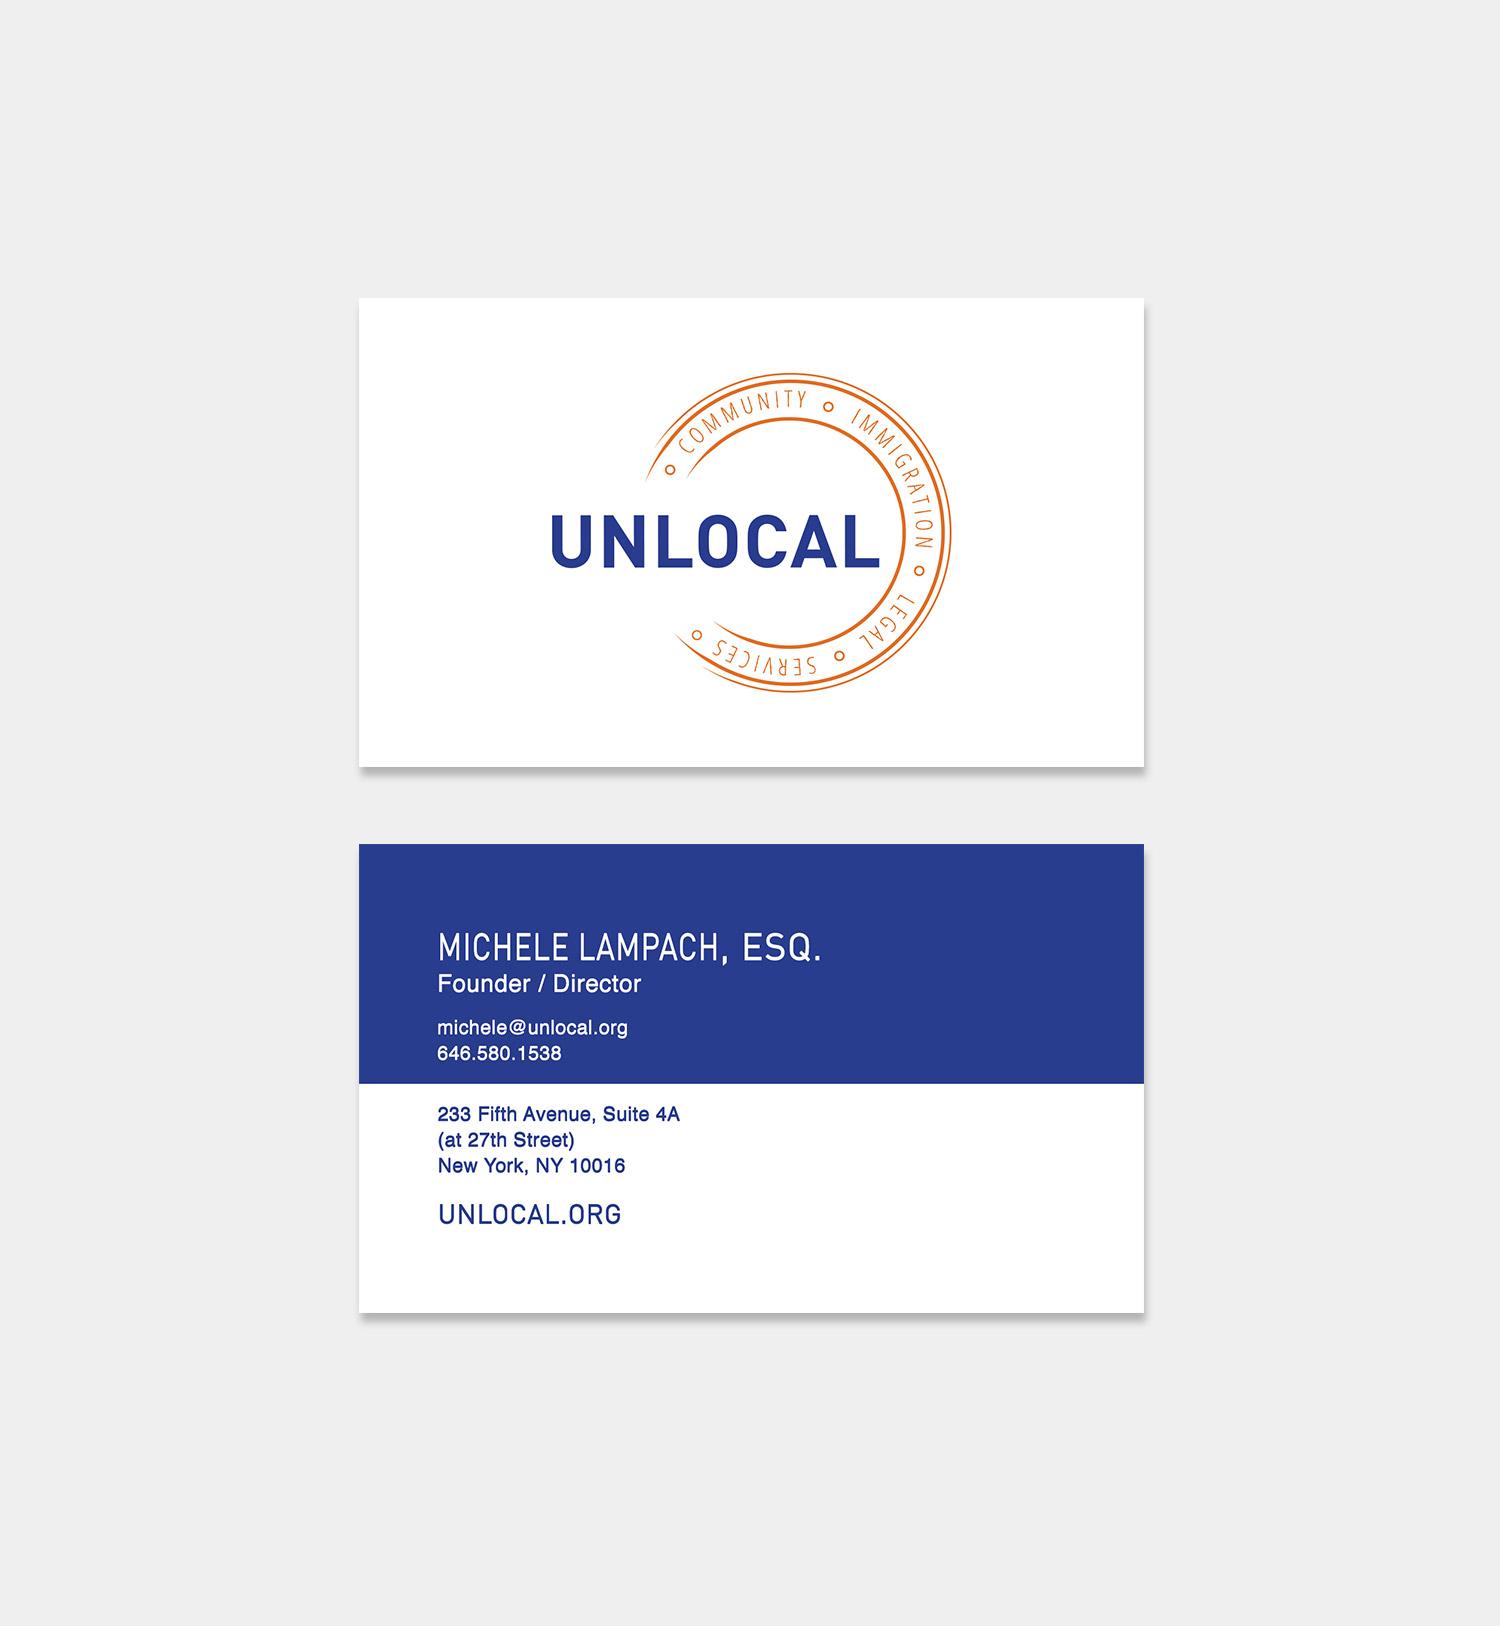 Unlocal Branding